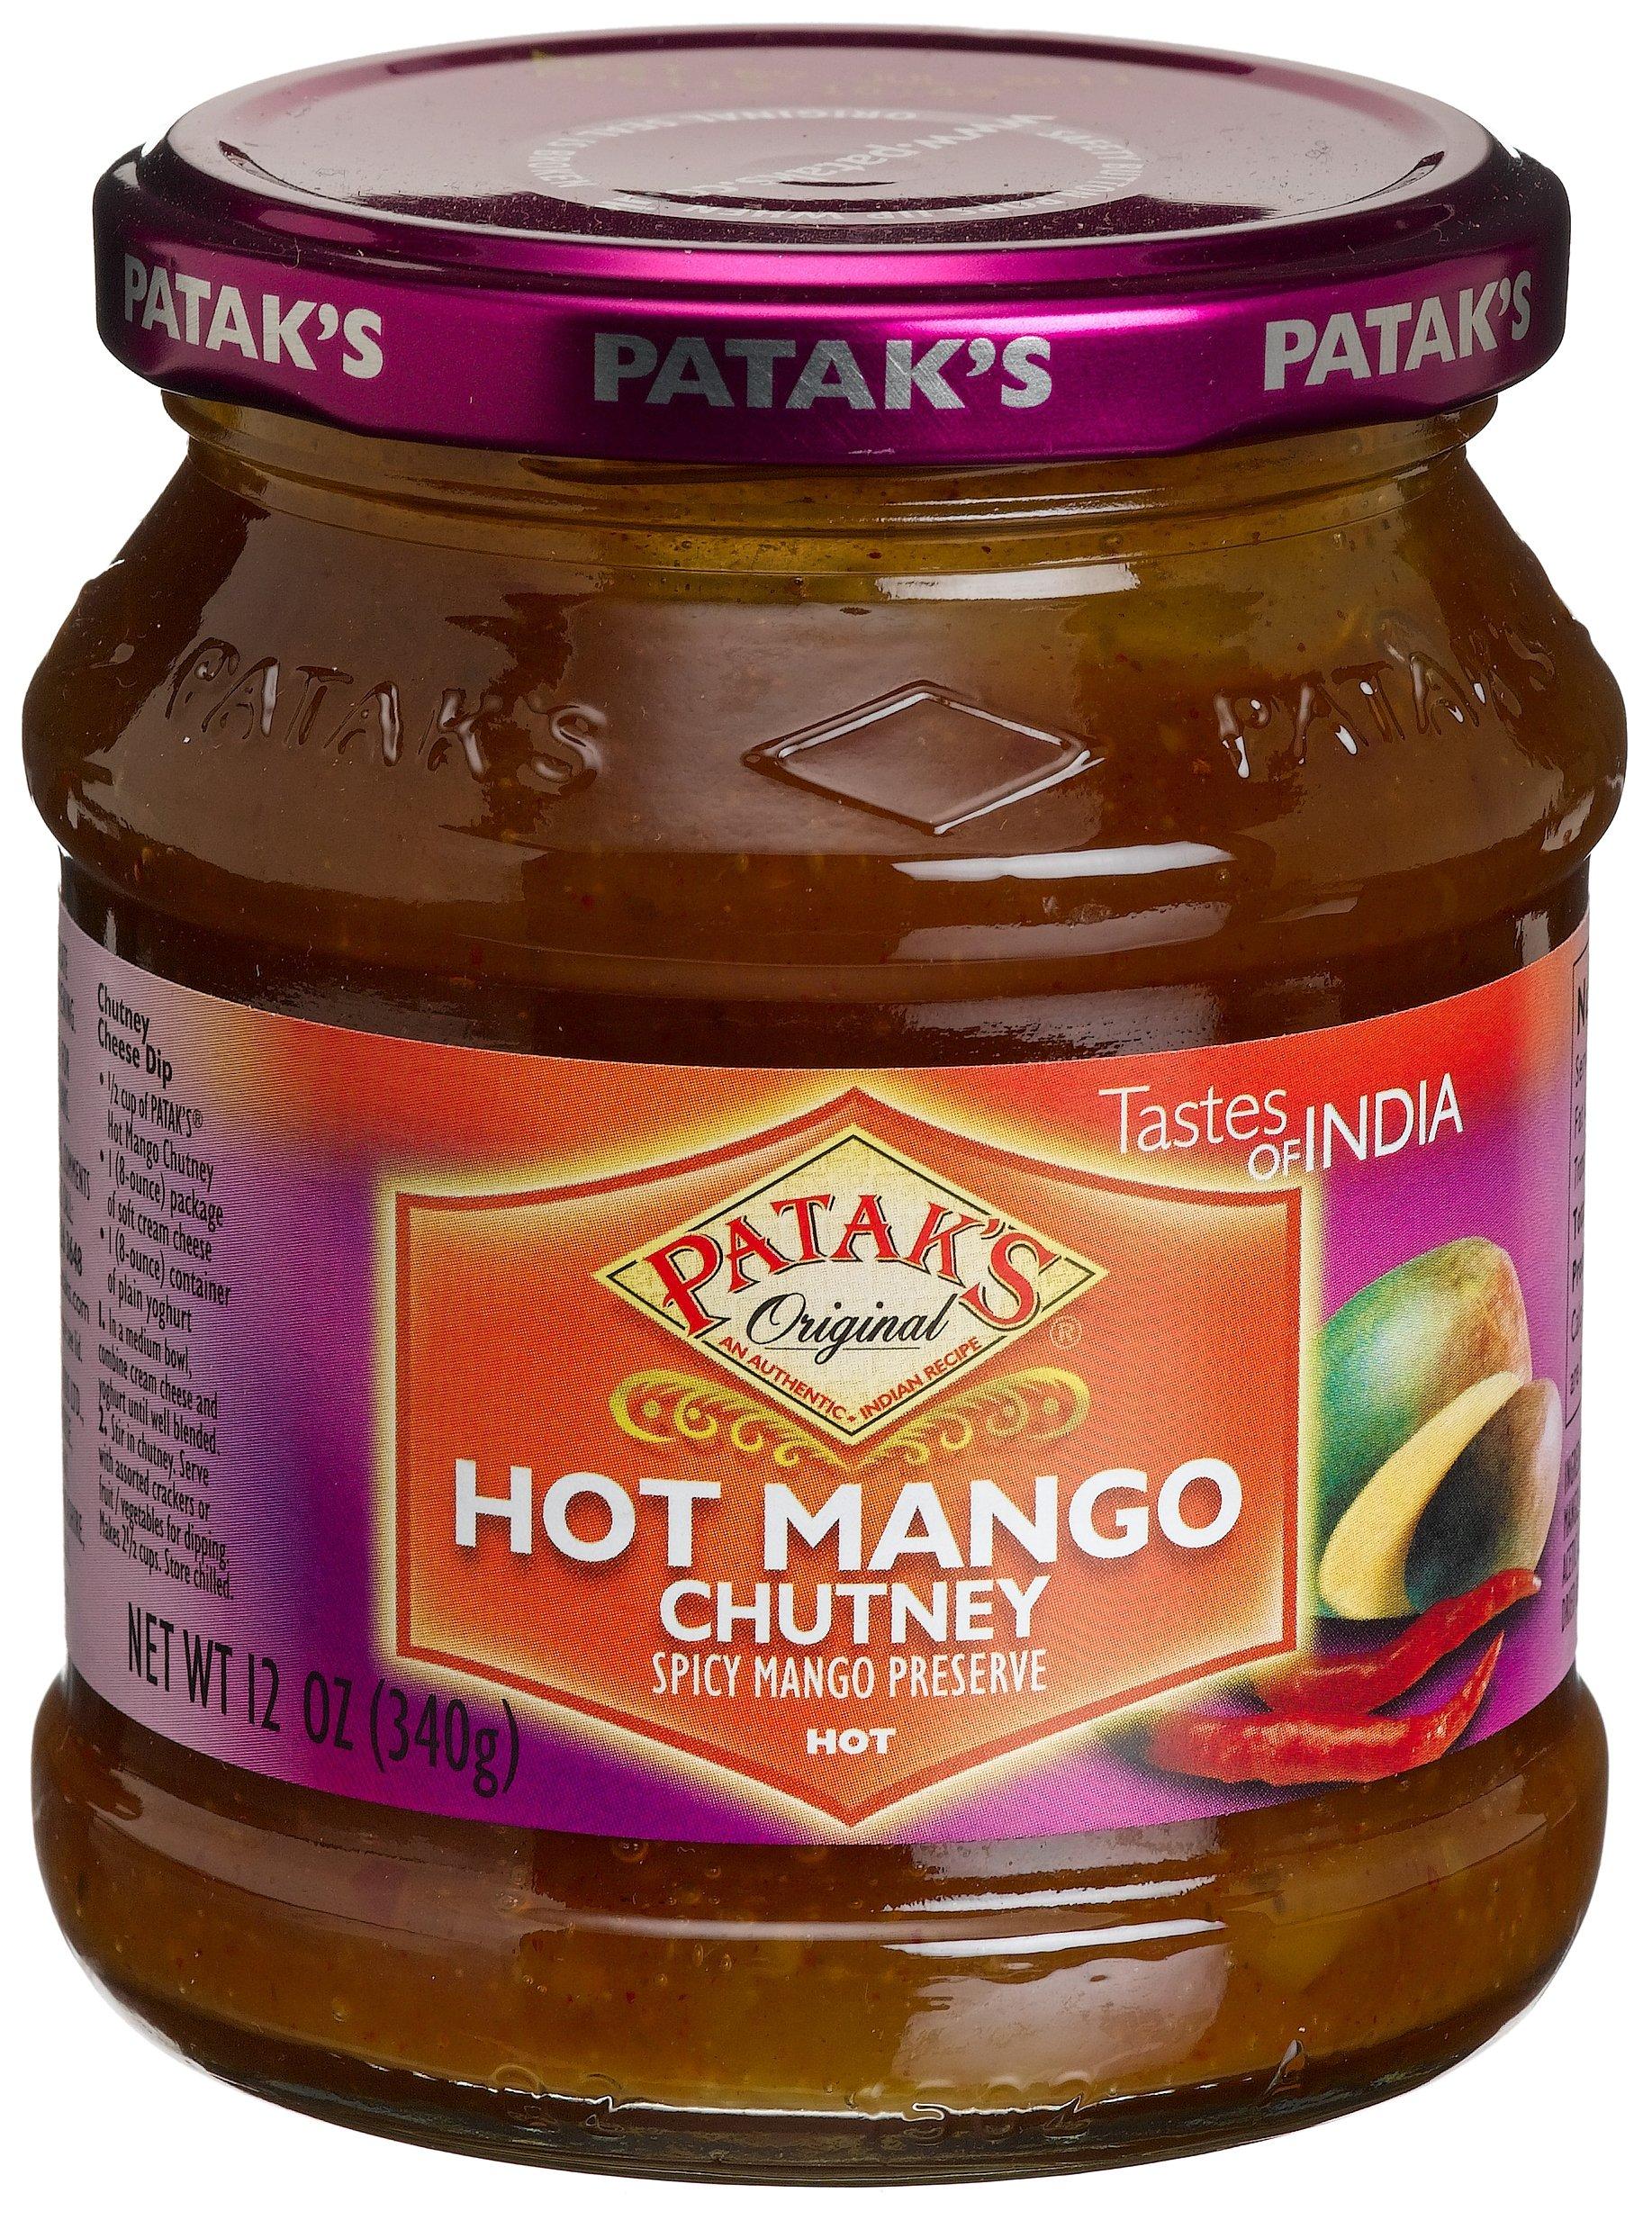 Patak's Hot Mango Chutney, 12-Ounce Glass Jars (Pack of 6)